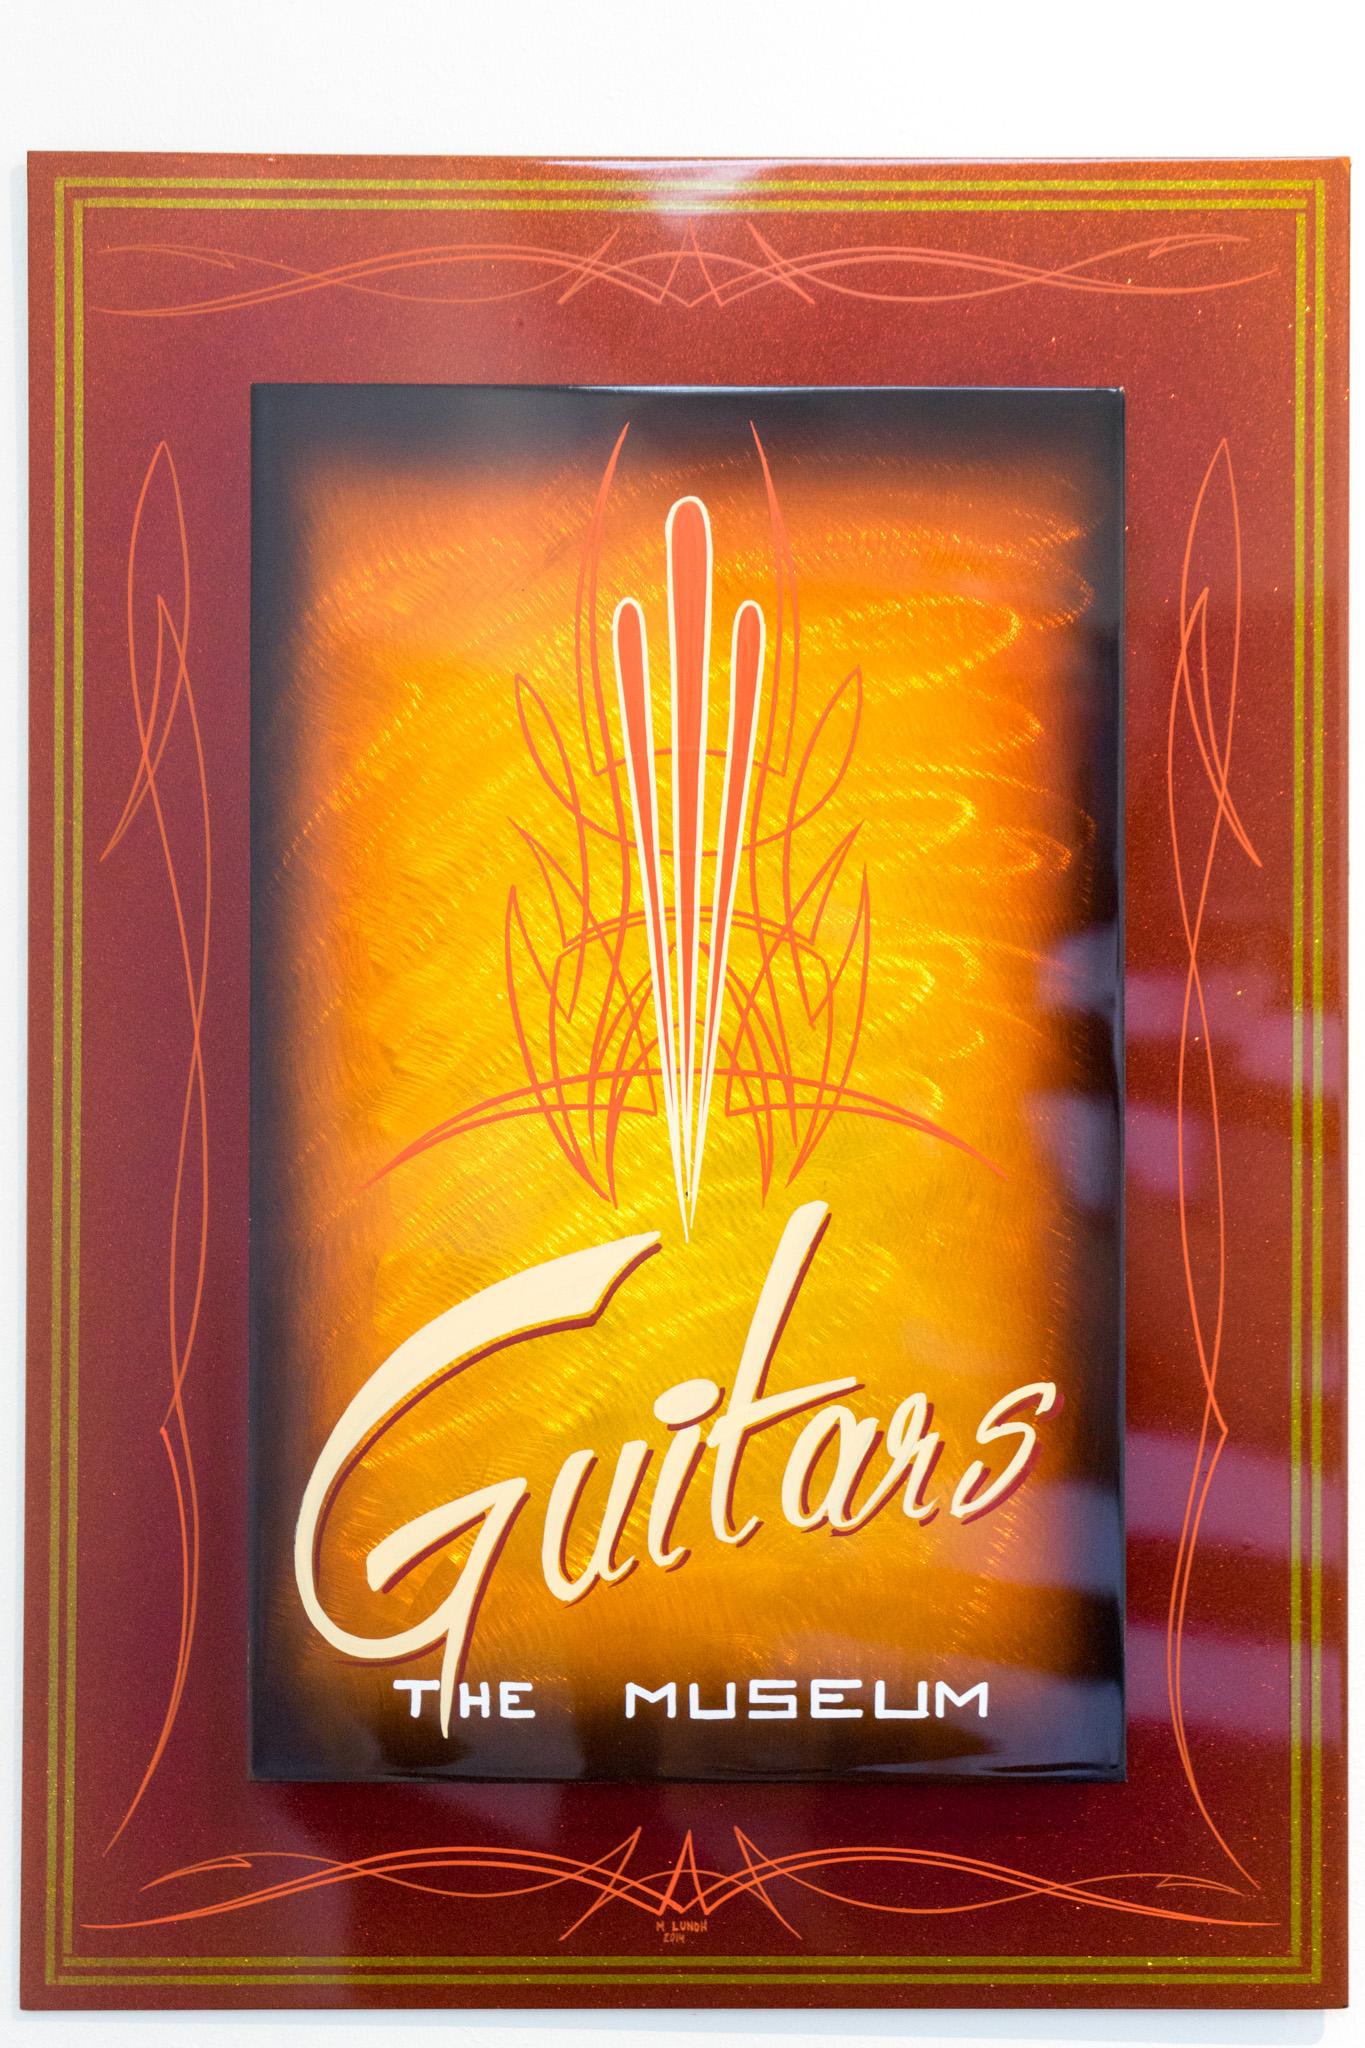 Guitars - The Museum